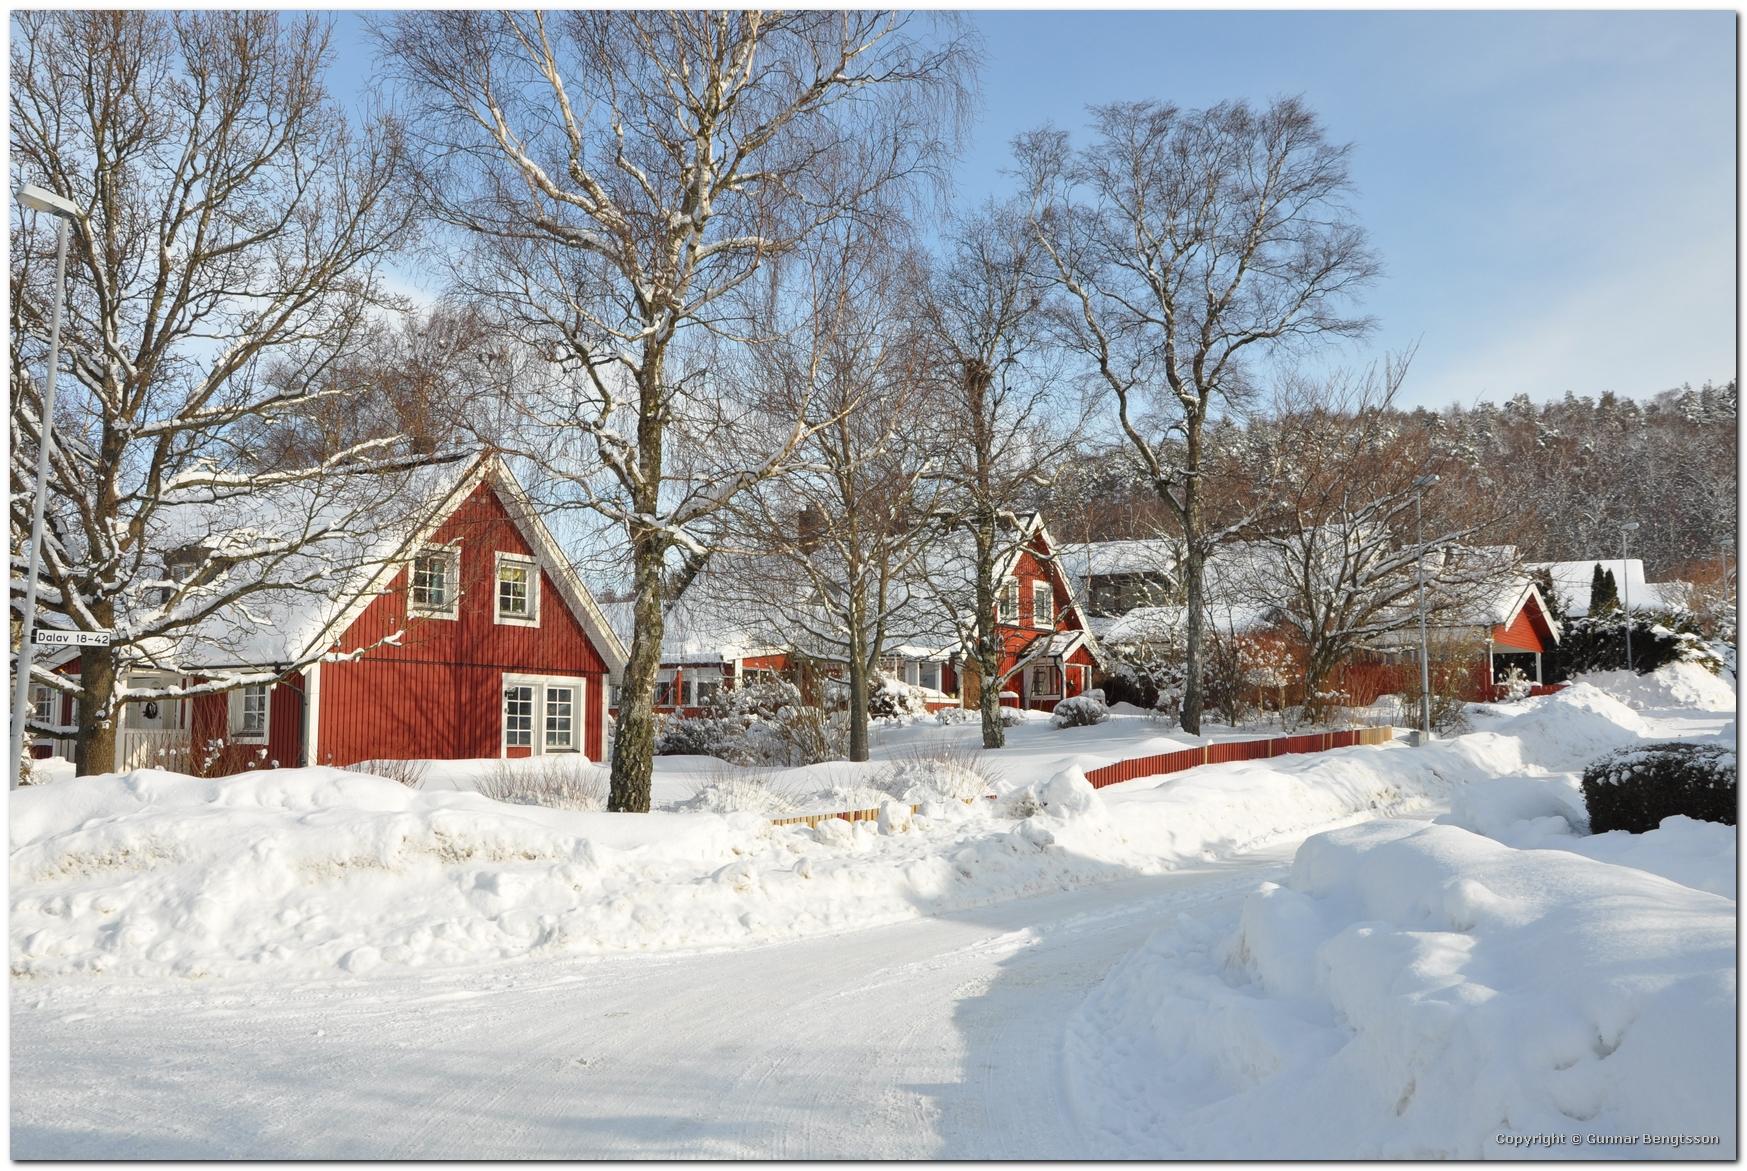 2010-02-24_15